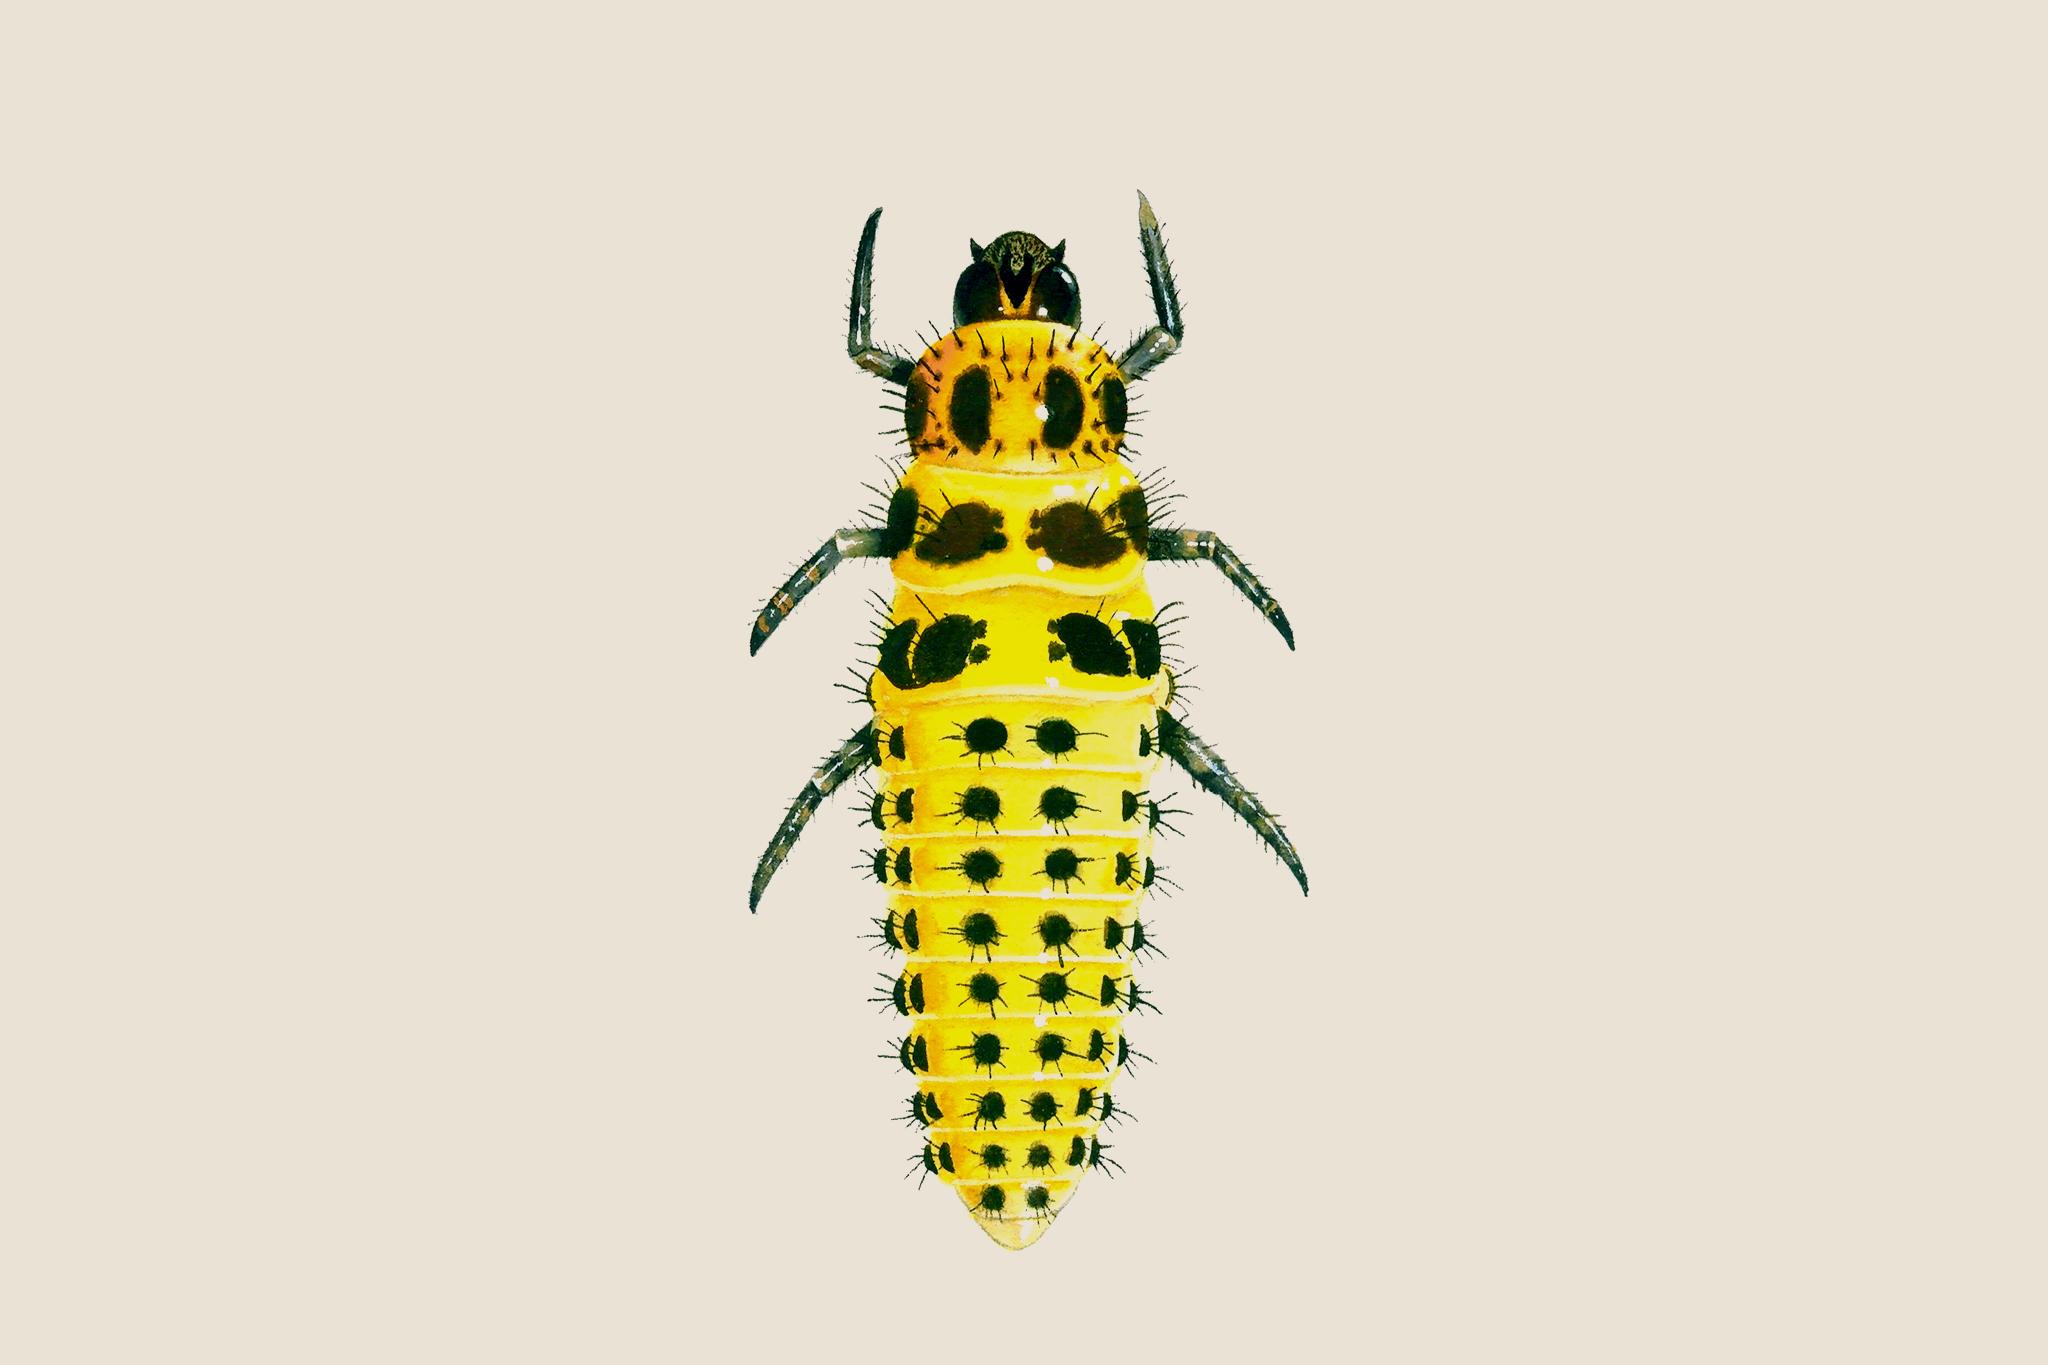 22-spot-ladybird-larvae-2